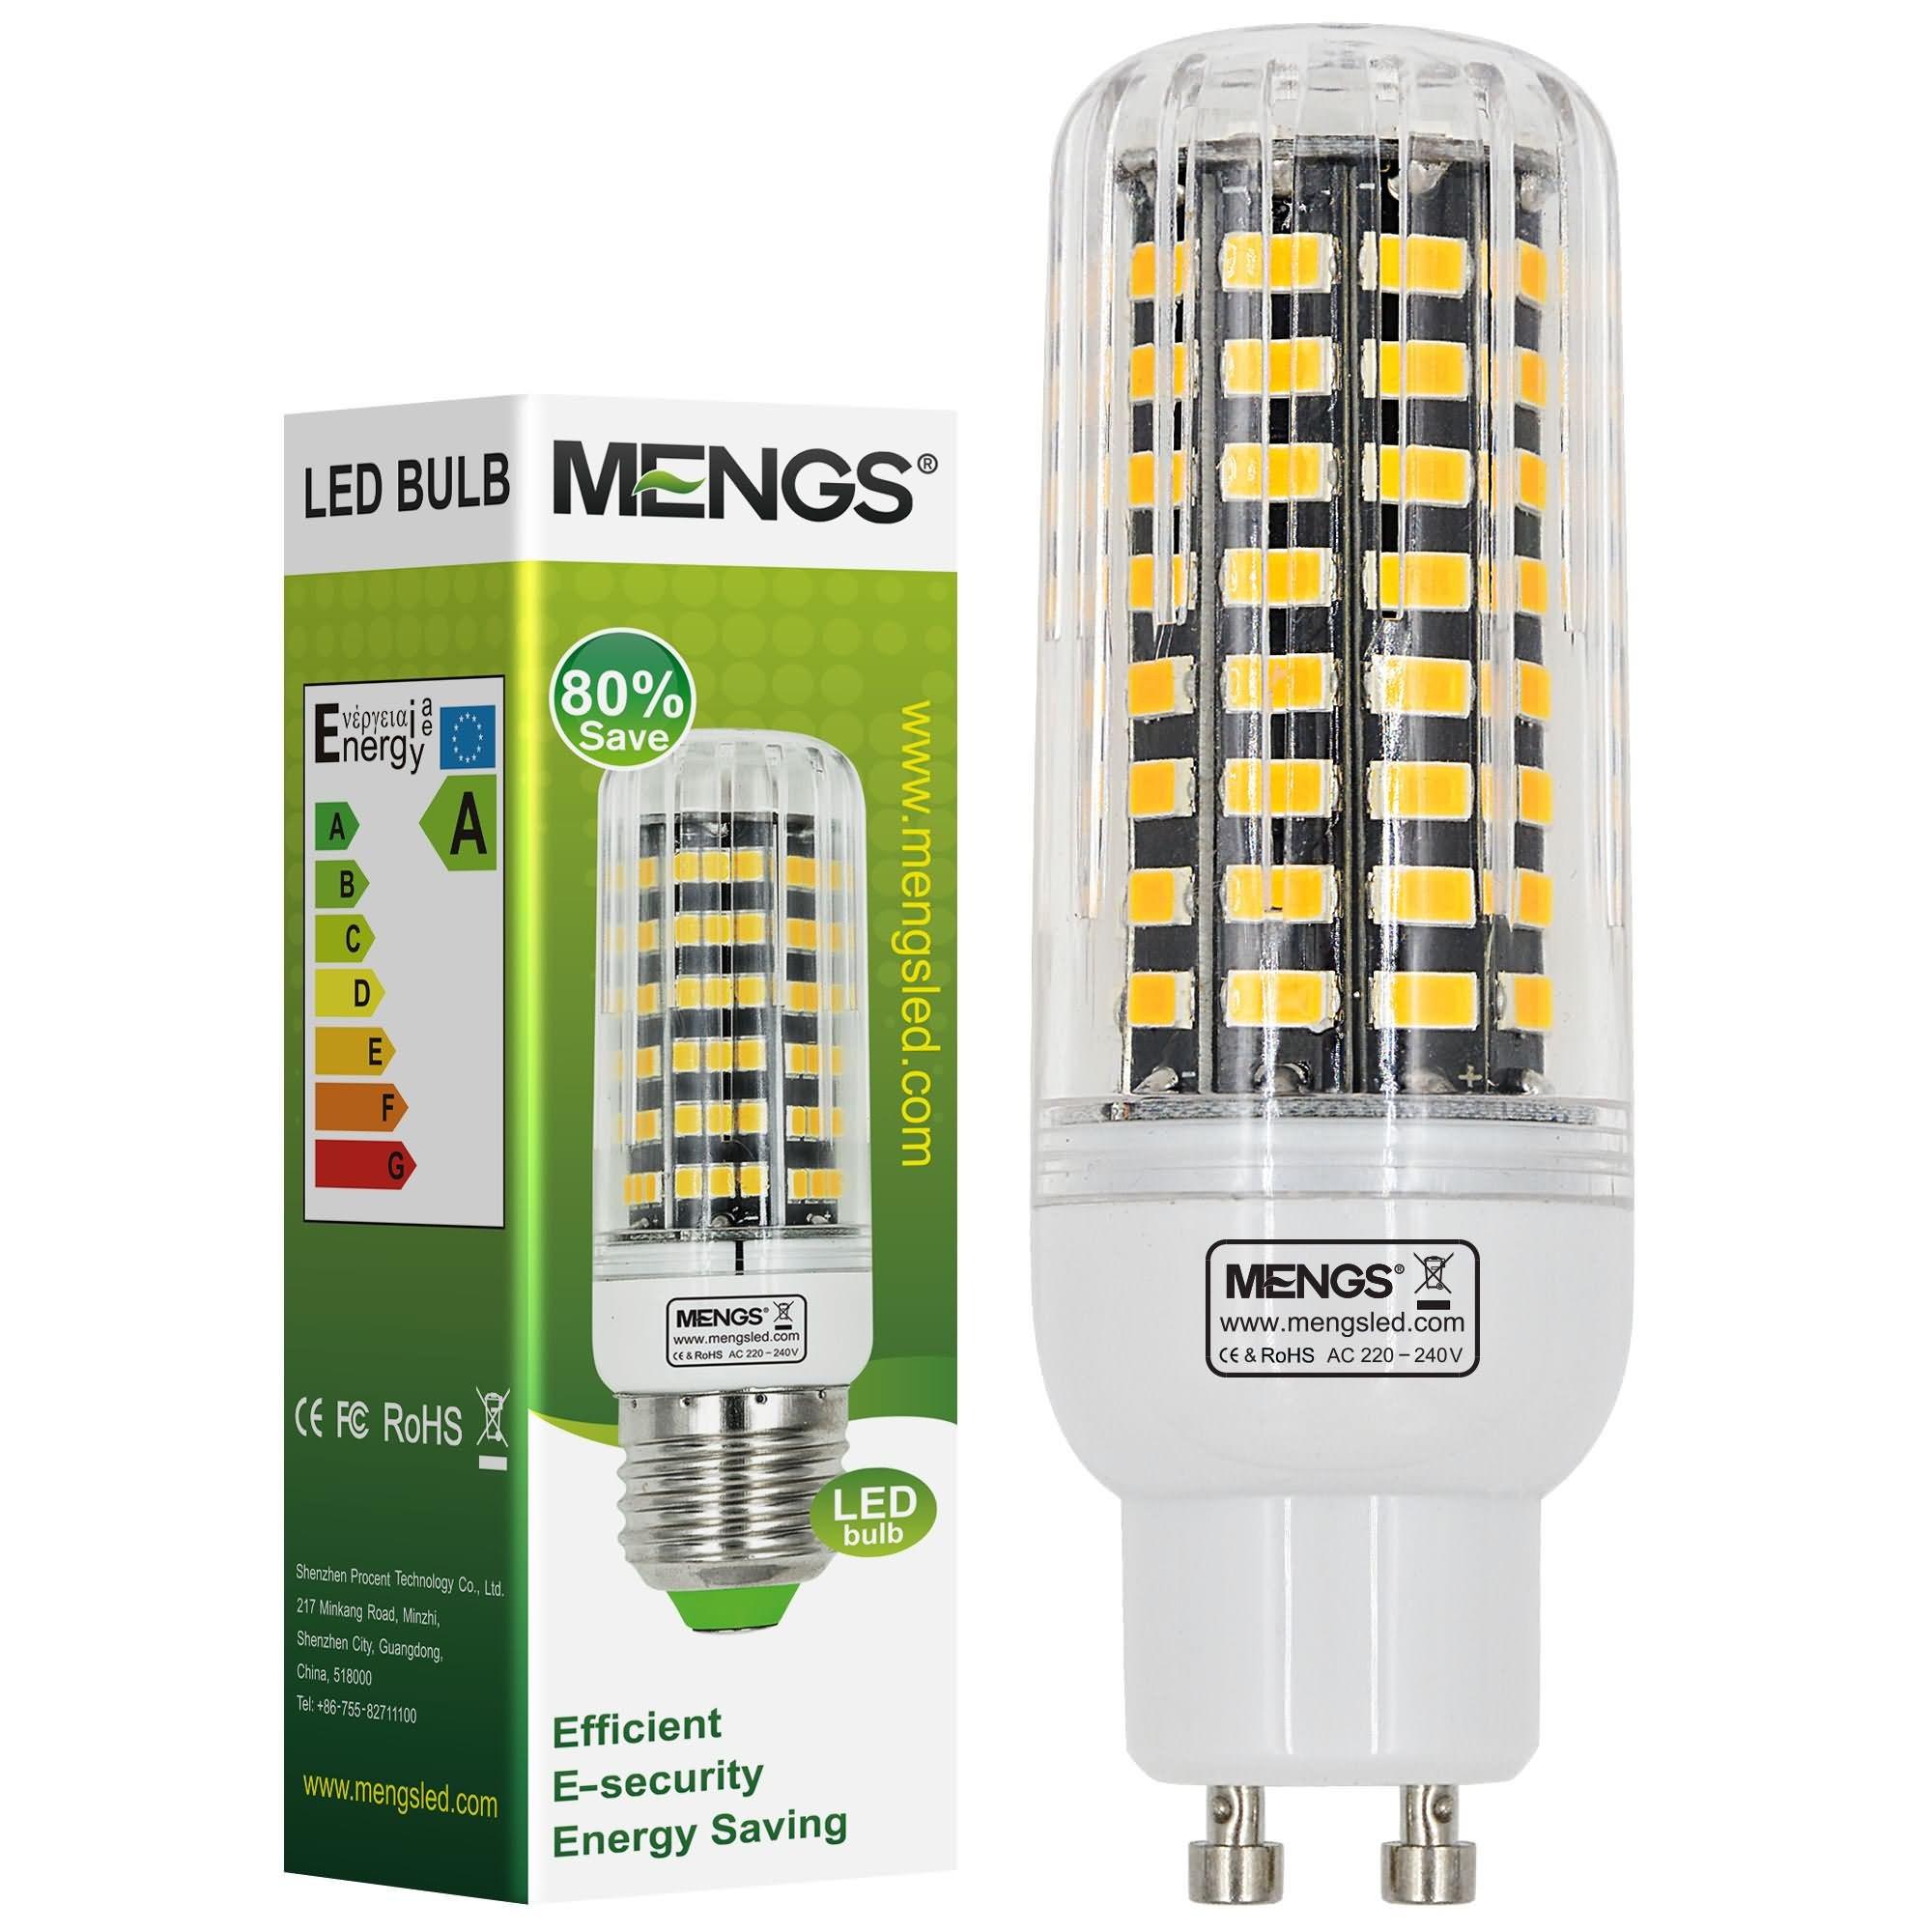 Mengsled Mengs Gu10 11w Led Corn Light 80x 5733 Smd Led Bulb Lamp In Warm White Cool White